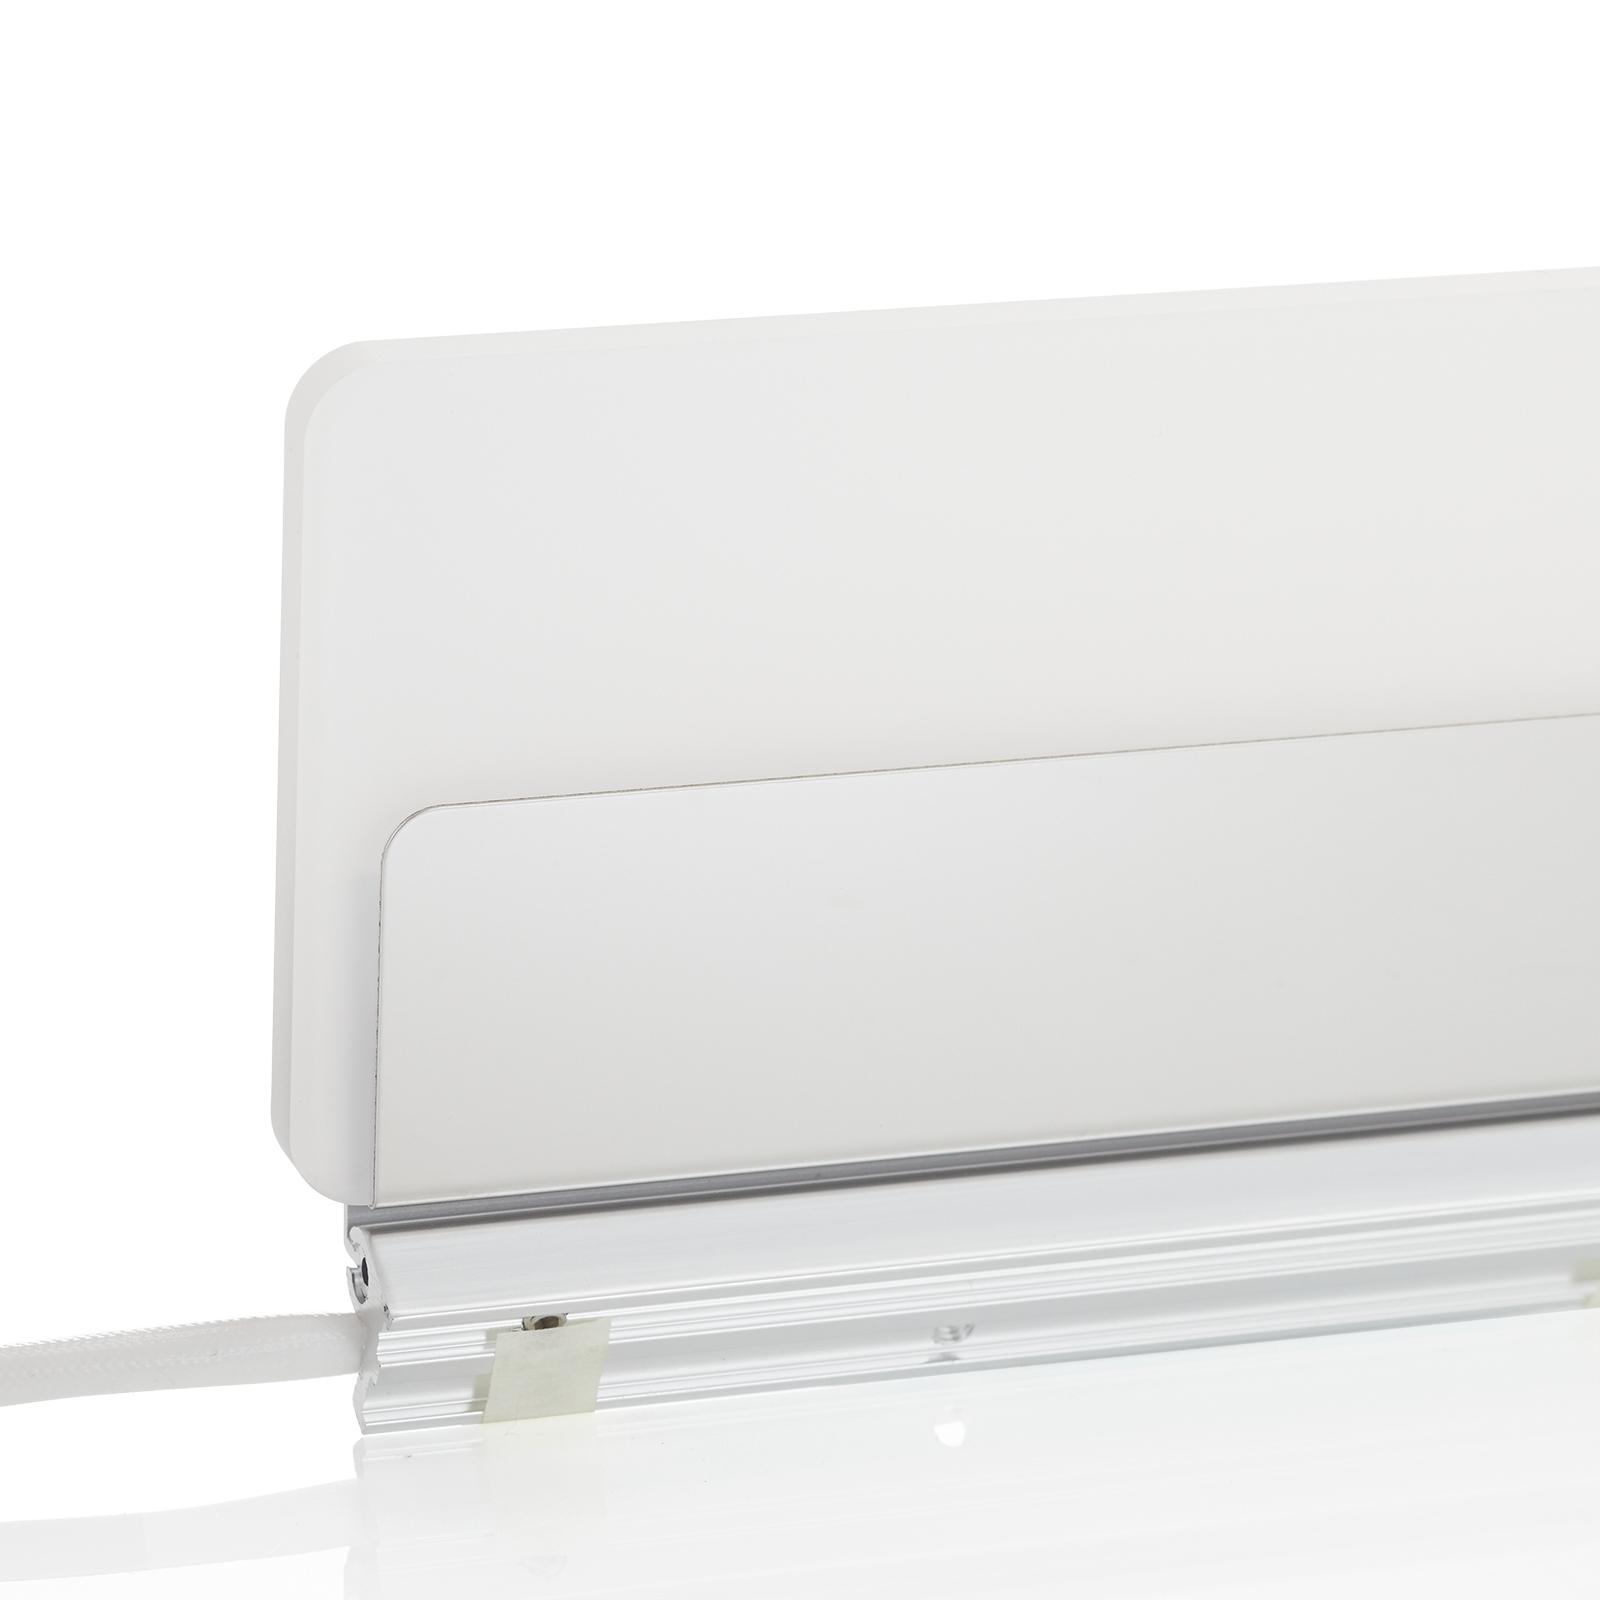 30 cm lang LED-speillampe Katherine S2, IP44